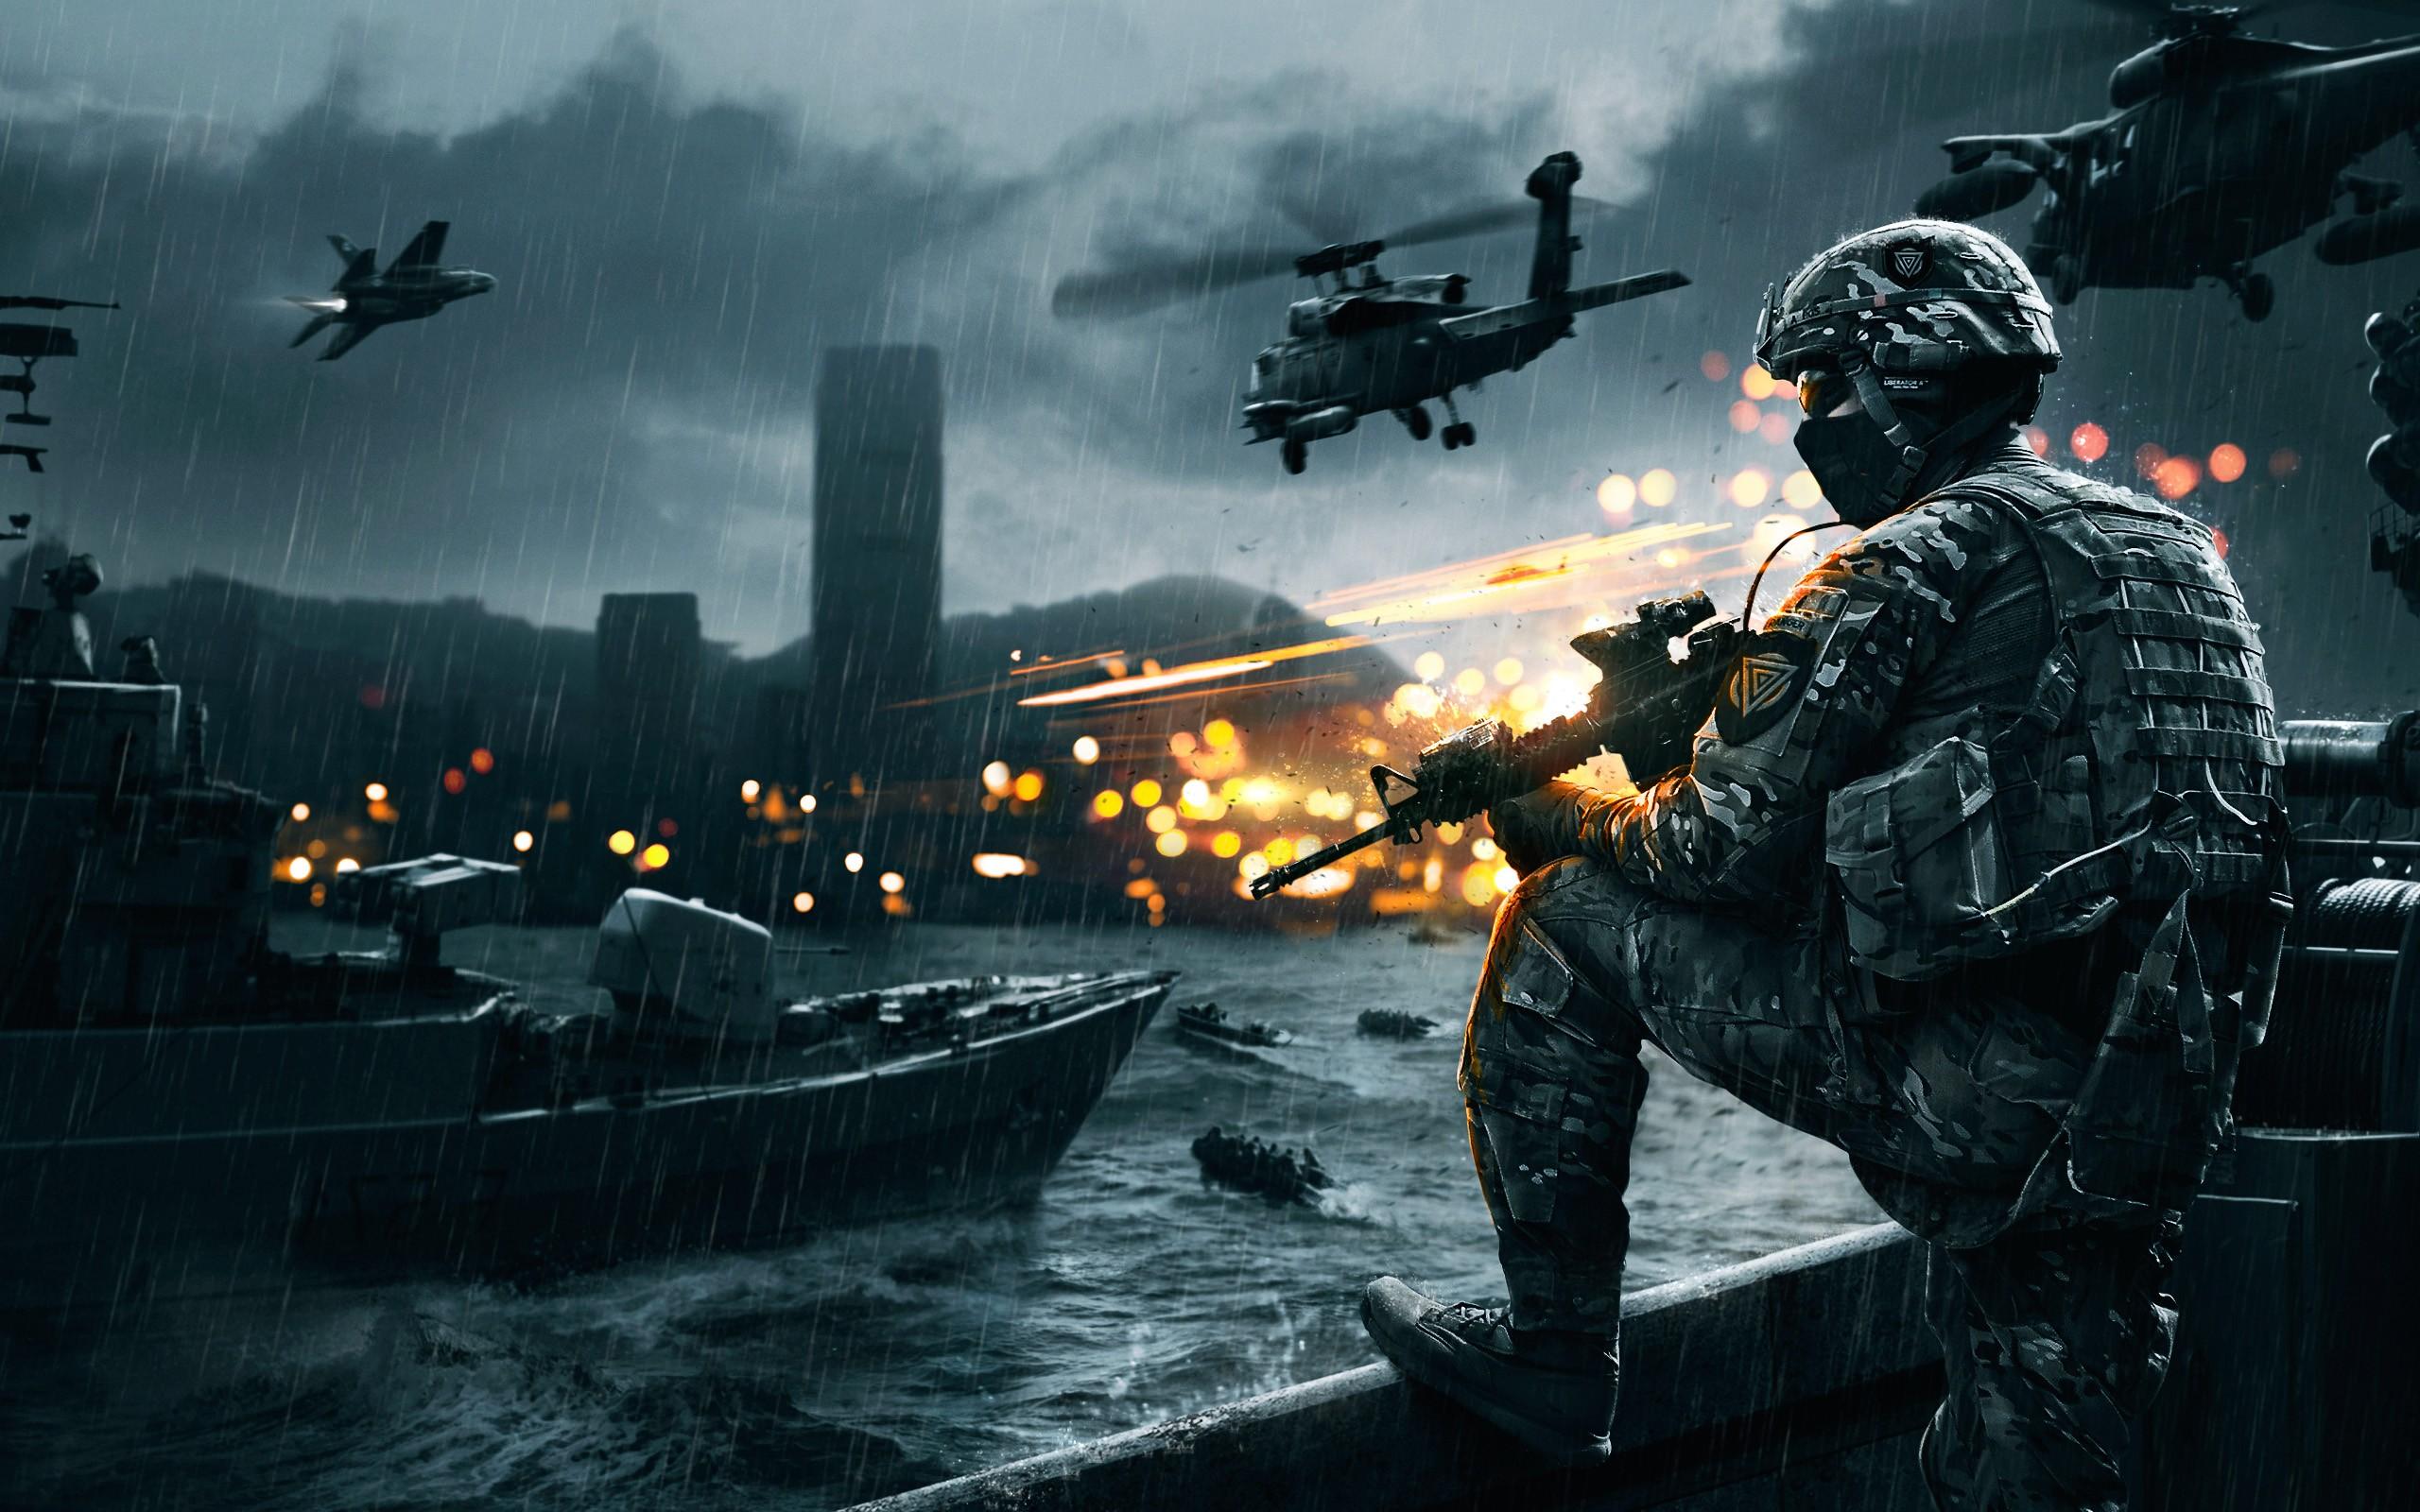 Battlefield 4 Siege of Shanghai Wallpapers HD Wallpapers 2560x1600